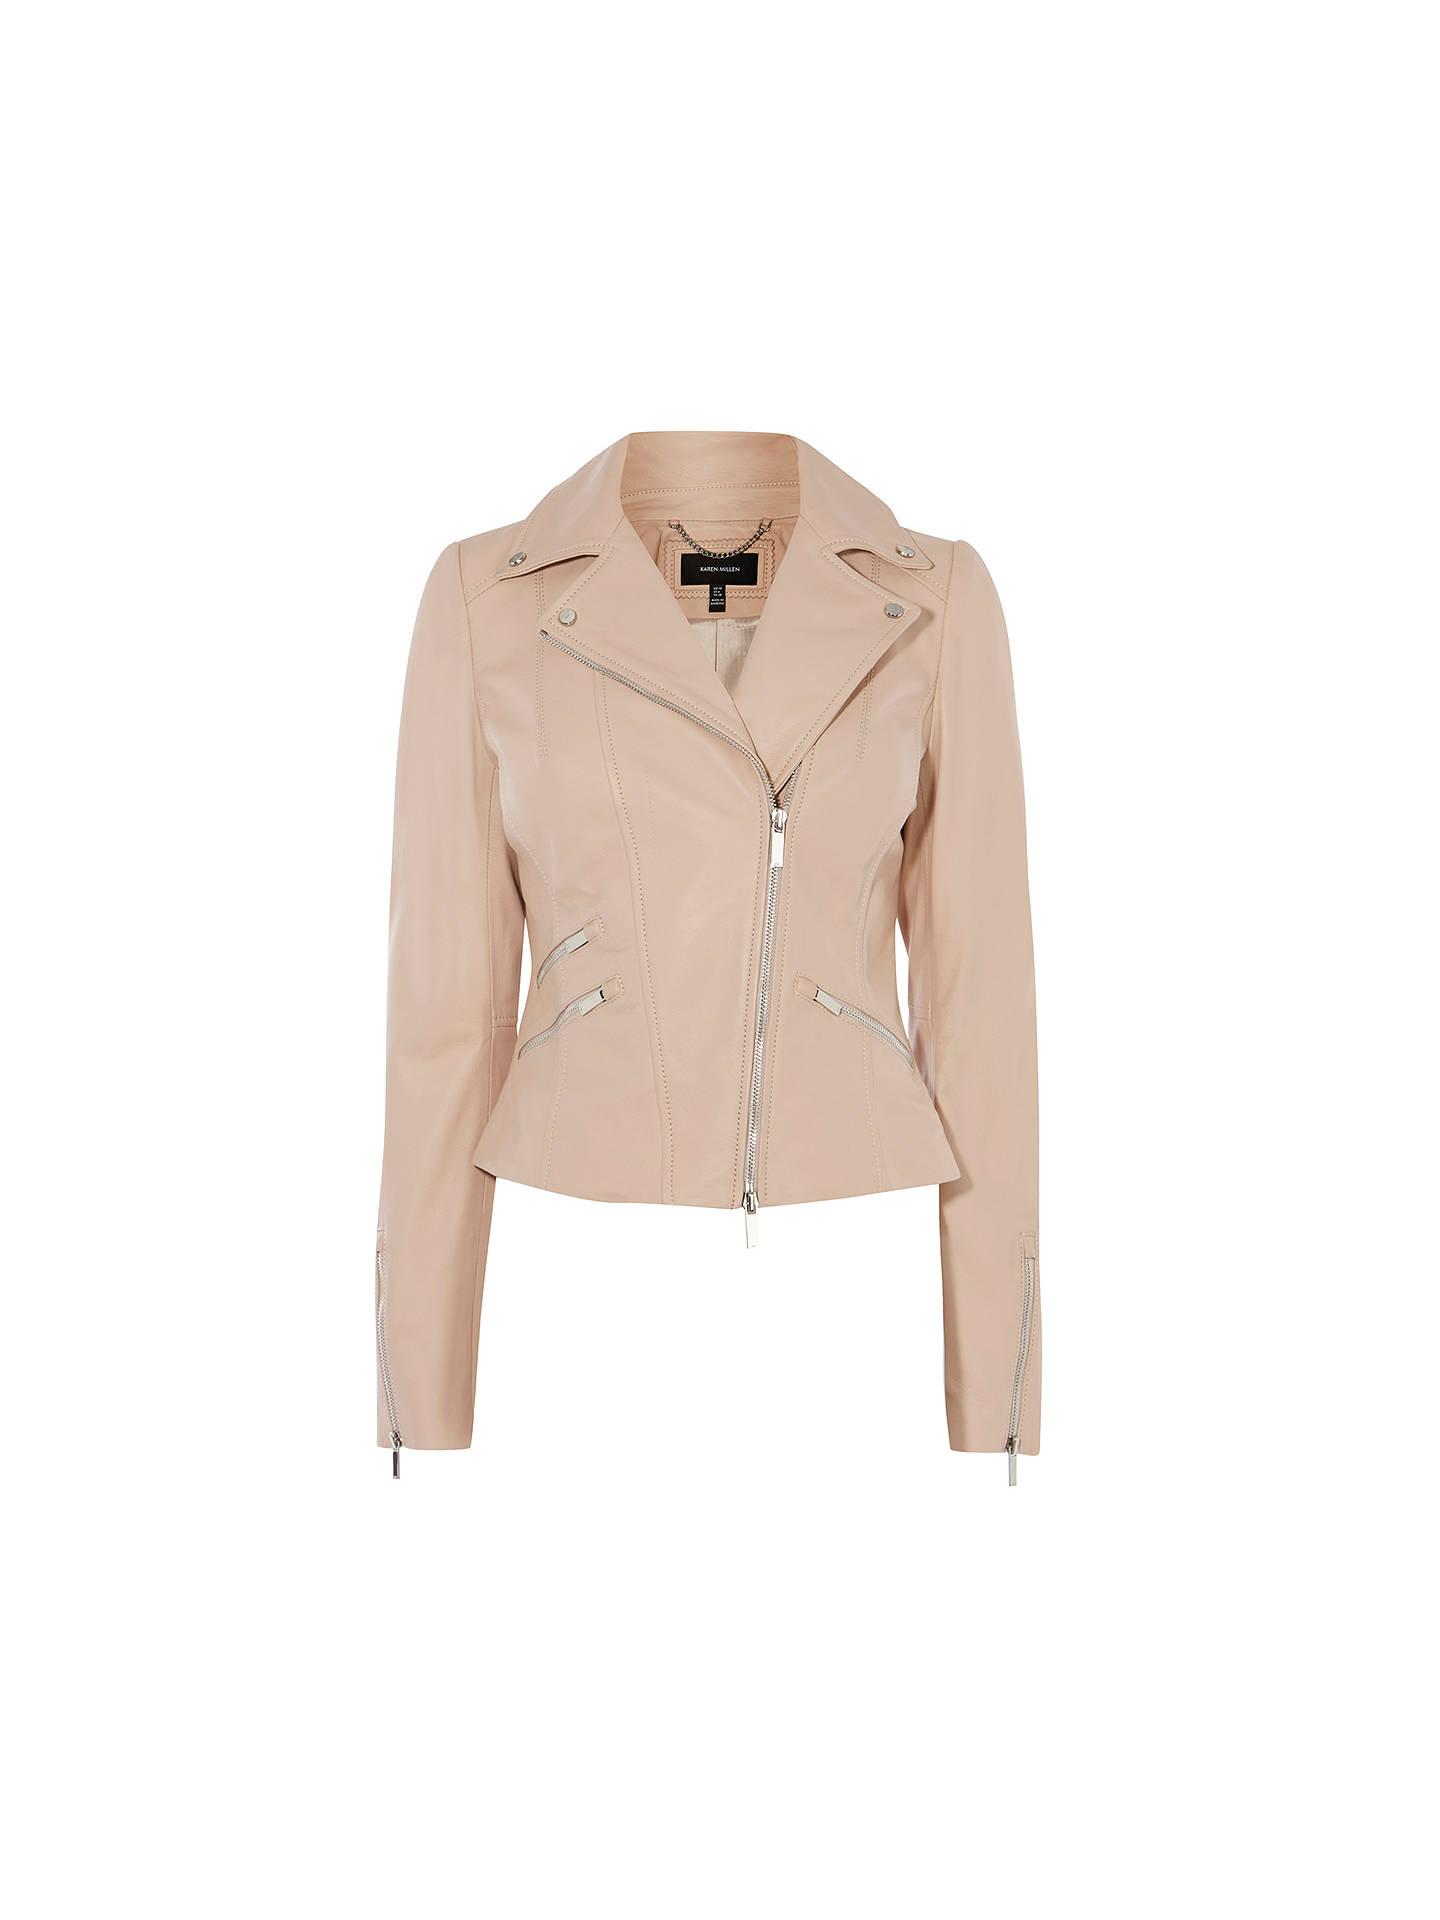 db997b6ee Karen Millen Summer Leather Jacket, Pale Pink at John Lewis & Partners